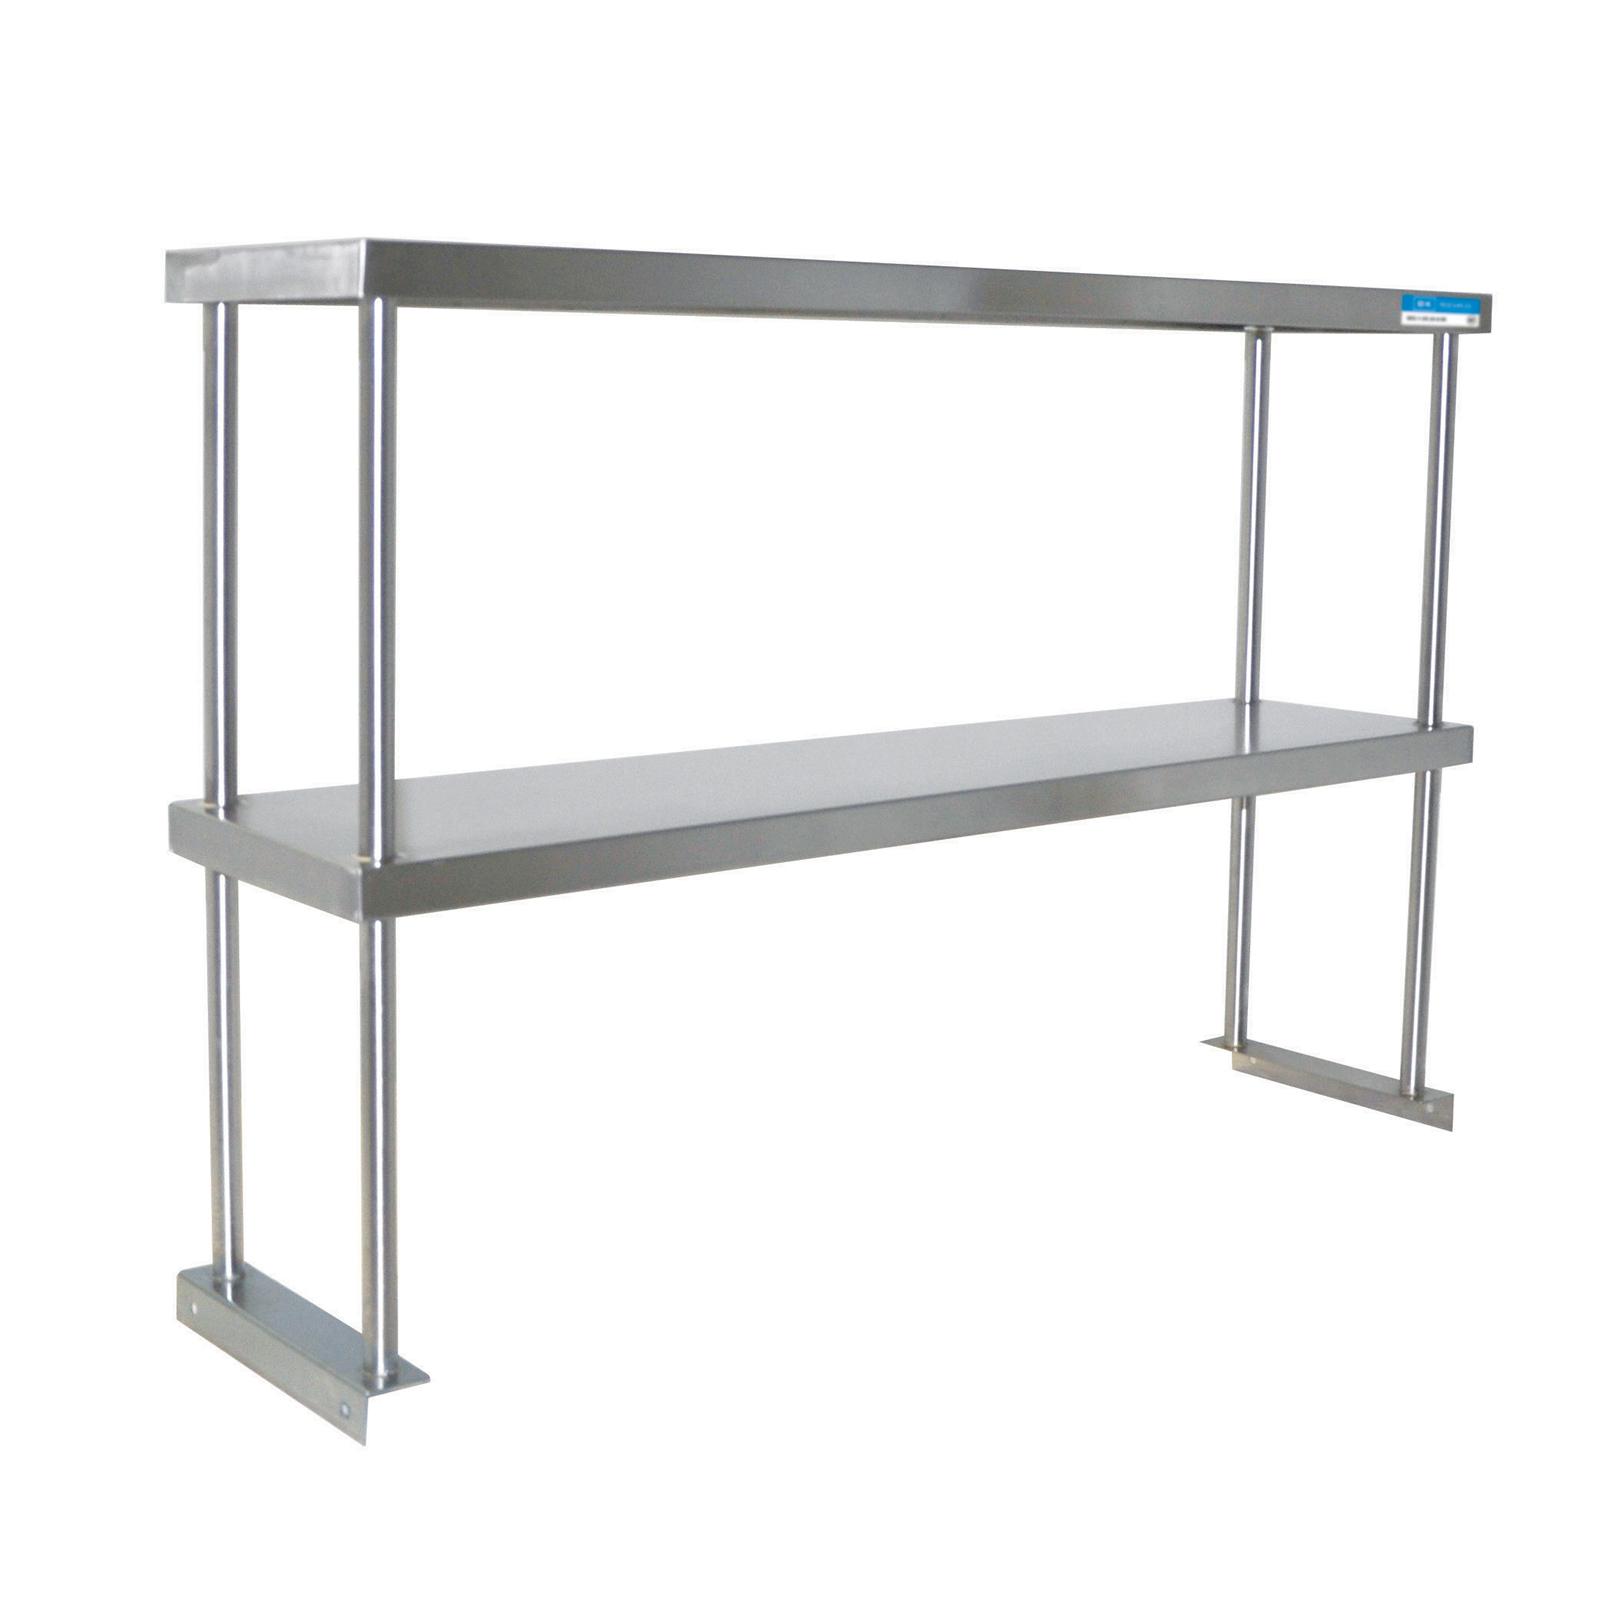 BK Resources BK-OSD-1260 overshelf, table-mounted